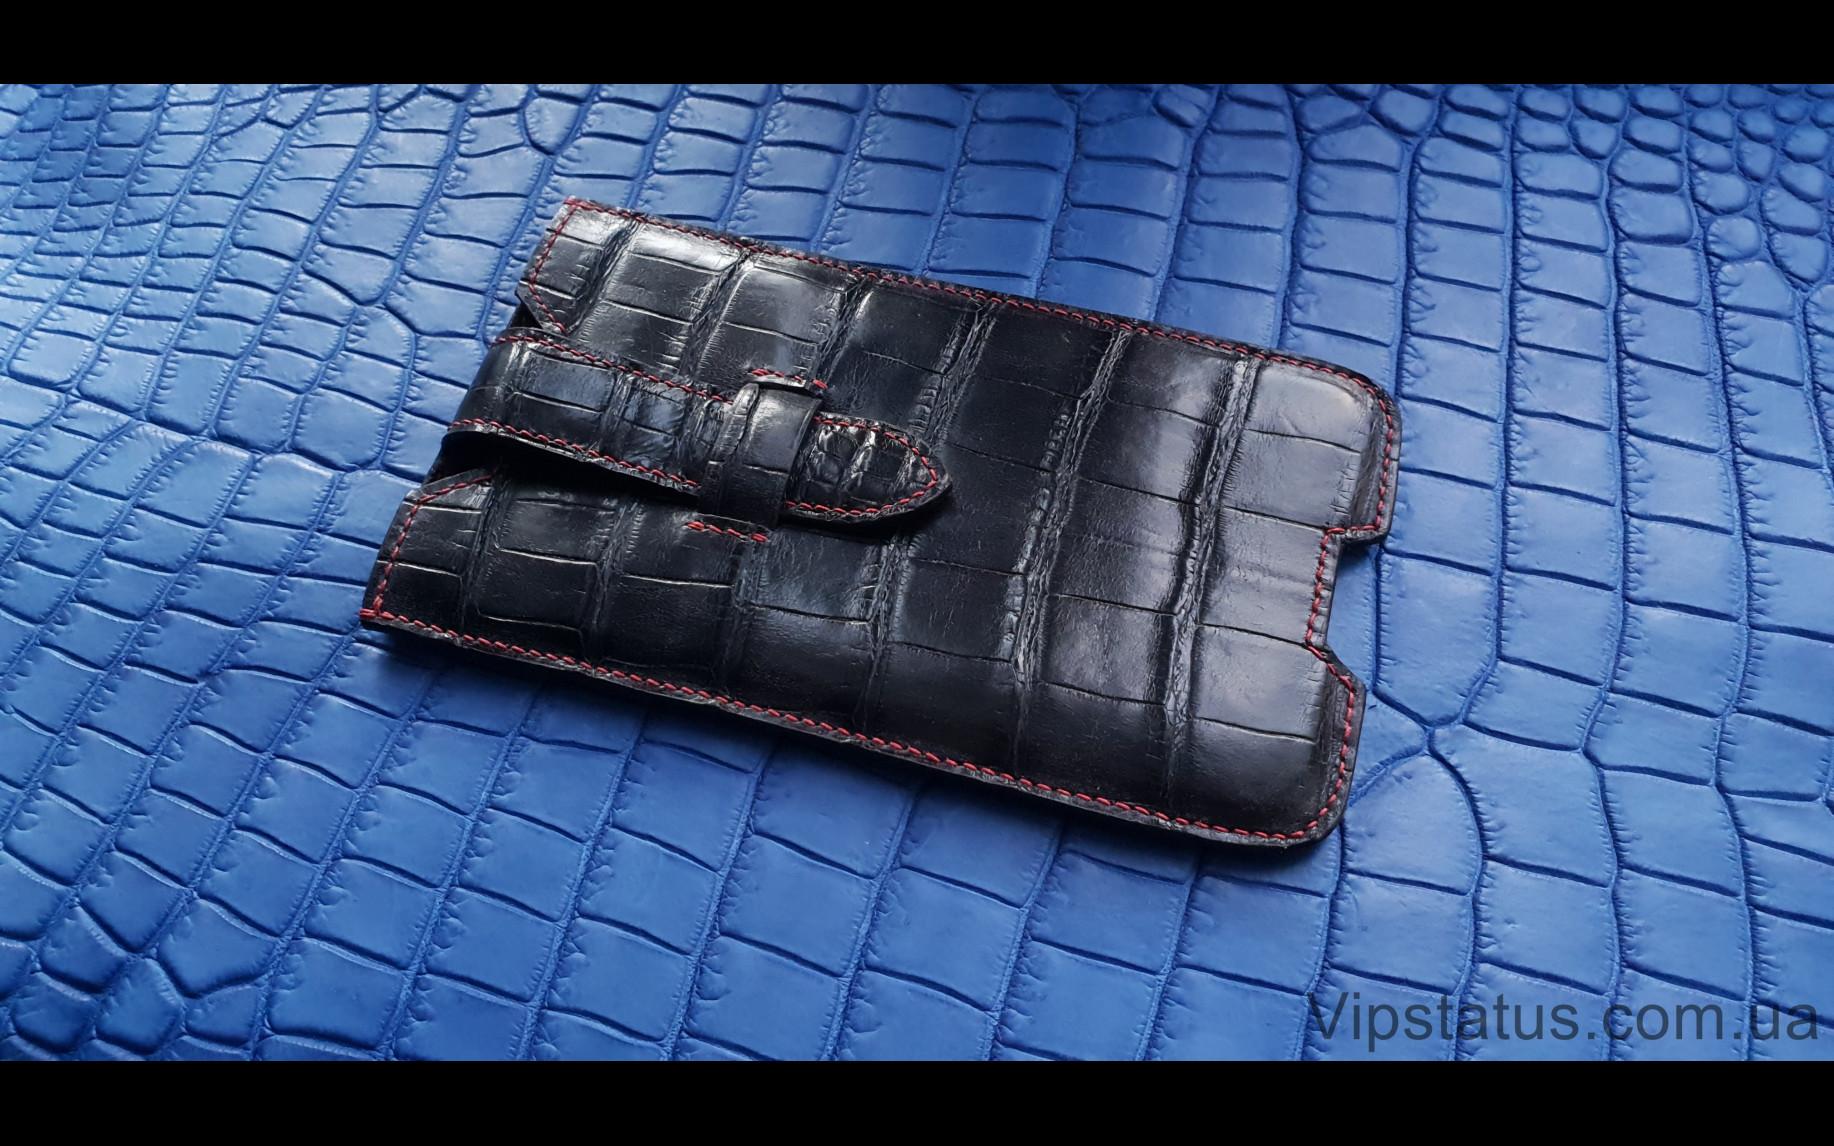 Elite Classic Edition Премиум кейс IPhone X XS 11 Pro 12 Pro Classic Edition Premium case IPhone X XS 11 Pro 12 Pro Crocodile leather image 2